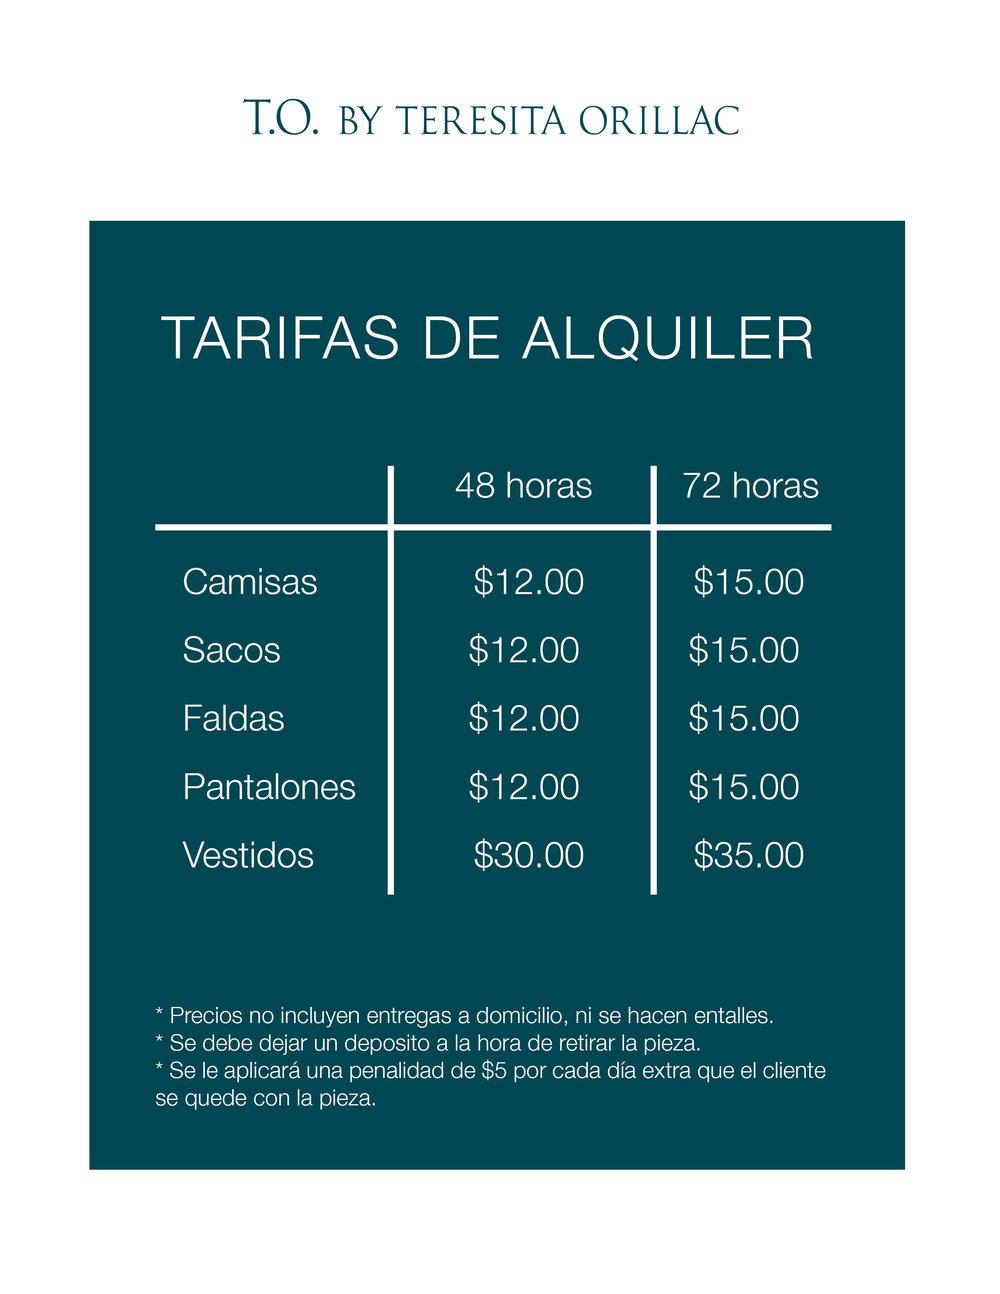 Promocion alquiler vestidos tarifas.jpg